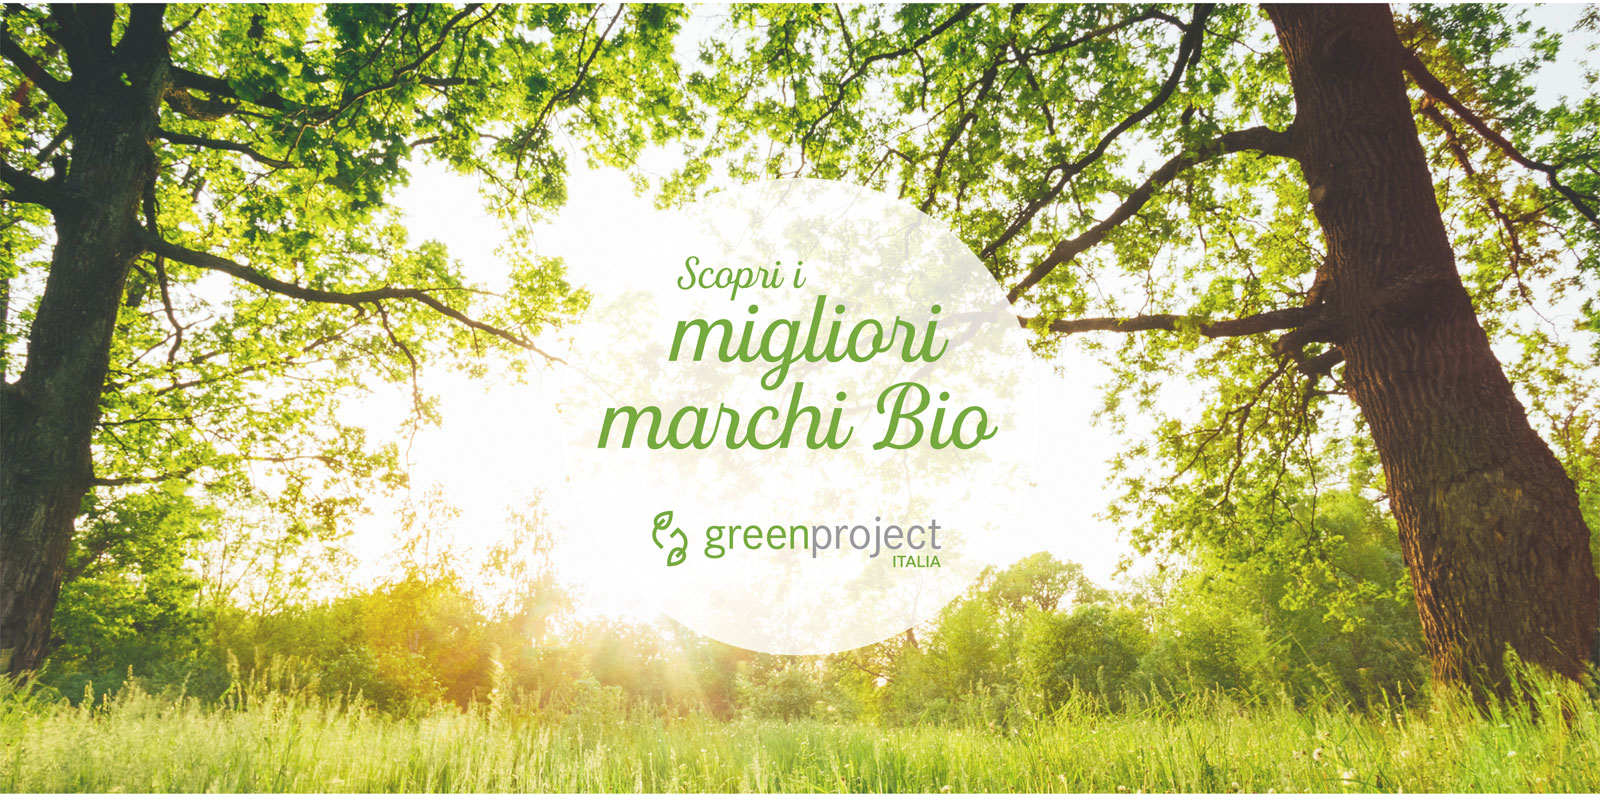 greenproject italia